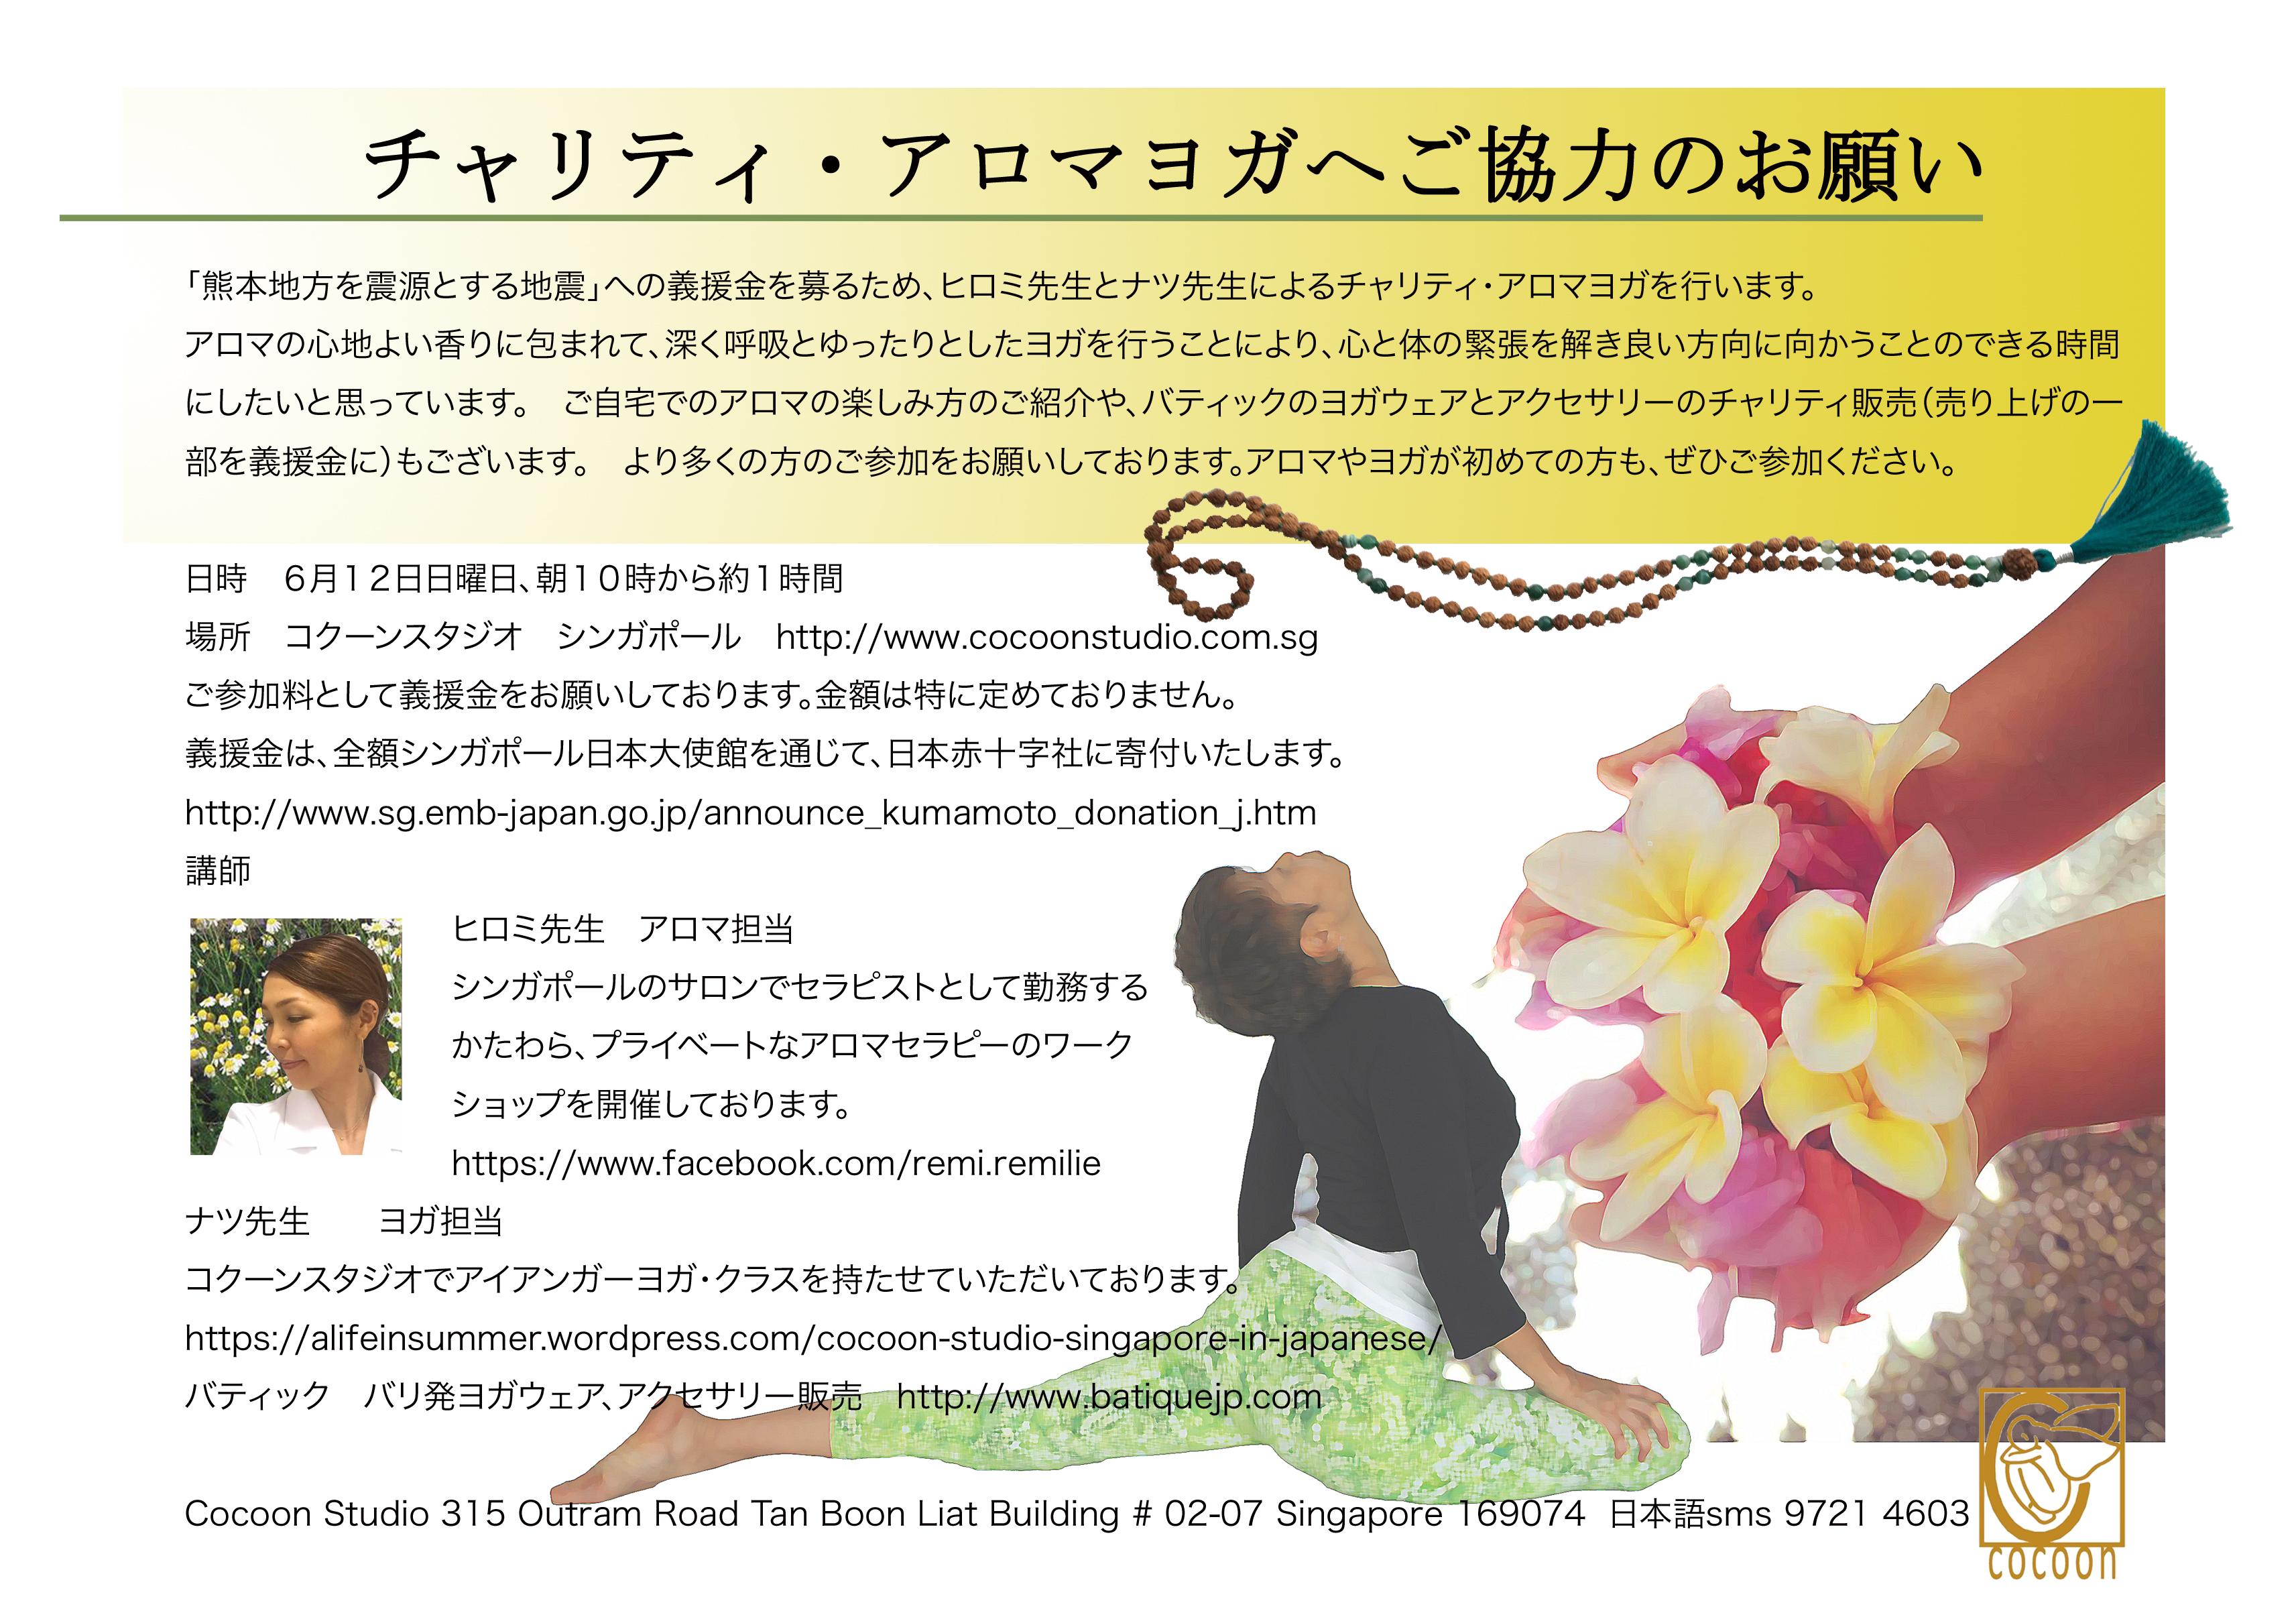 Kumamoto charity in Japanese